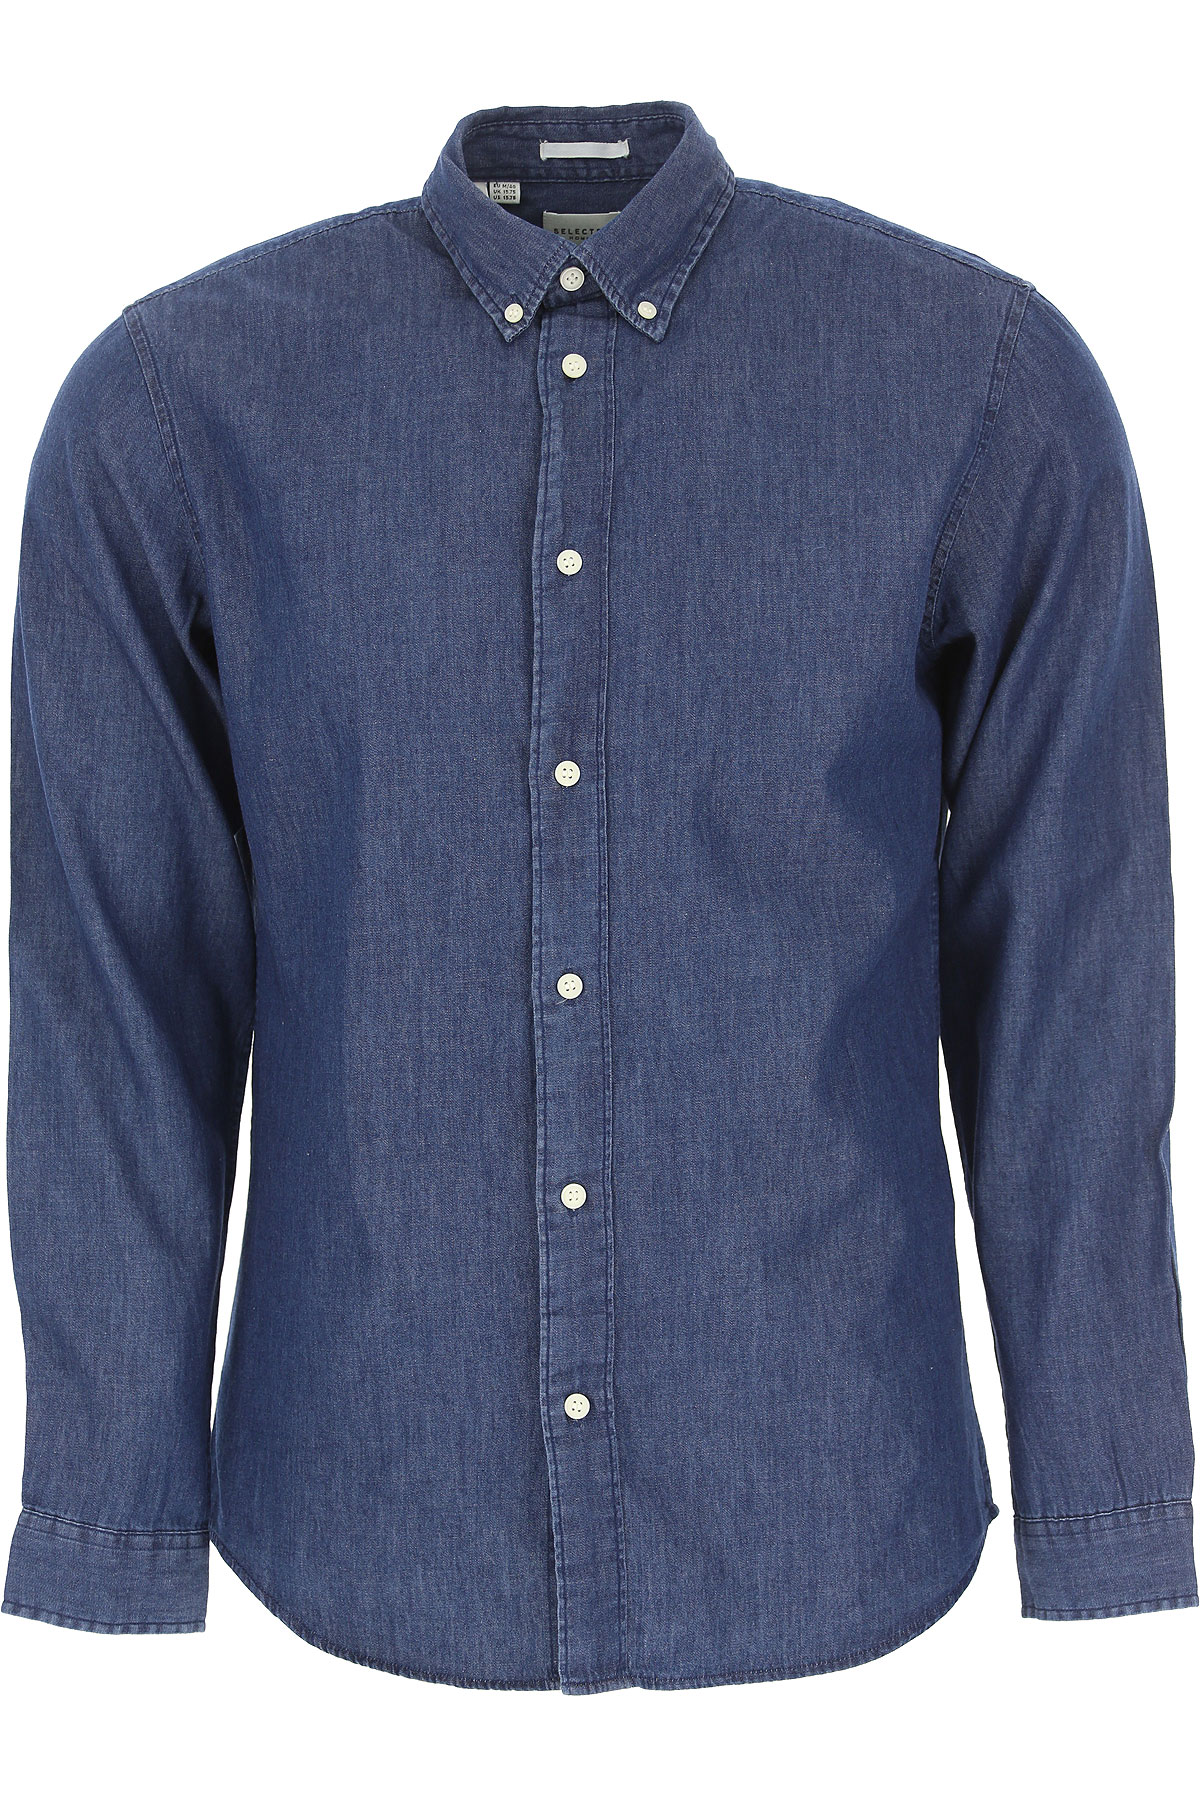 Selected Shirt for Men On Sale, Dark Blue, Cotton, 2019, S • IT 46 L • IT 50